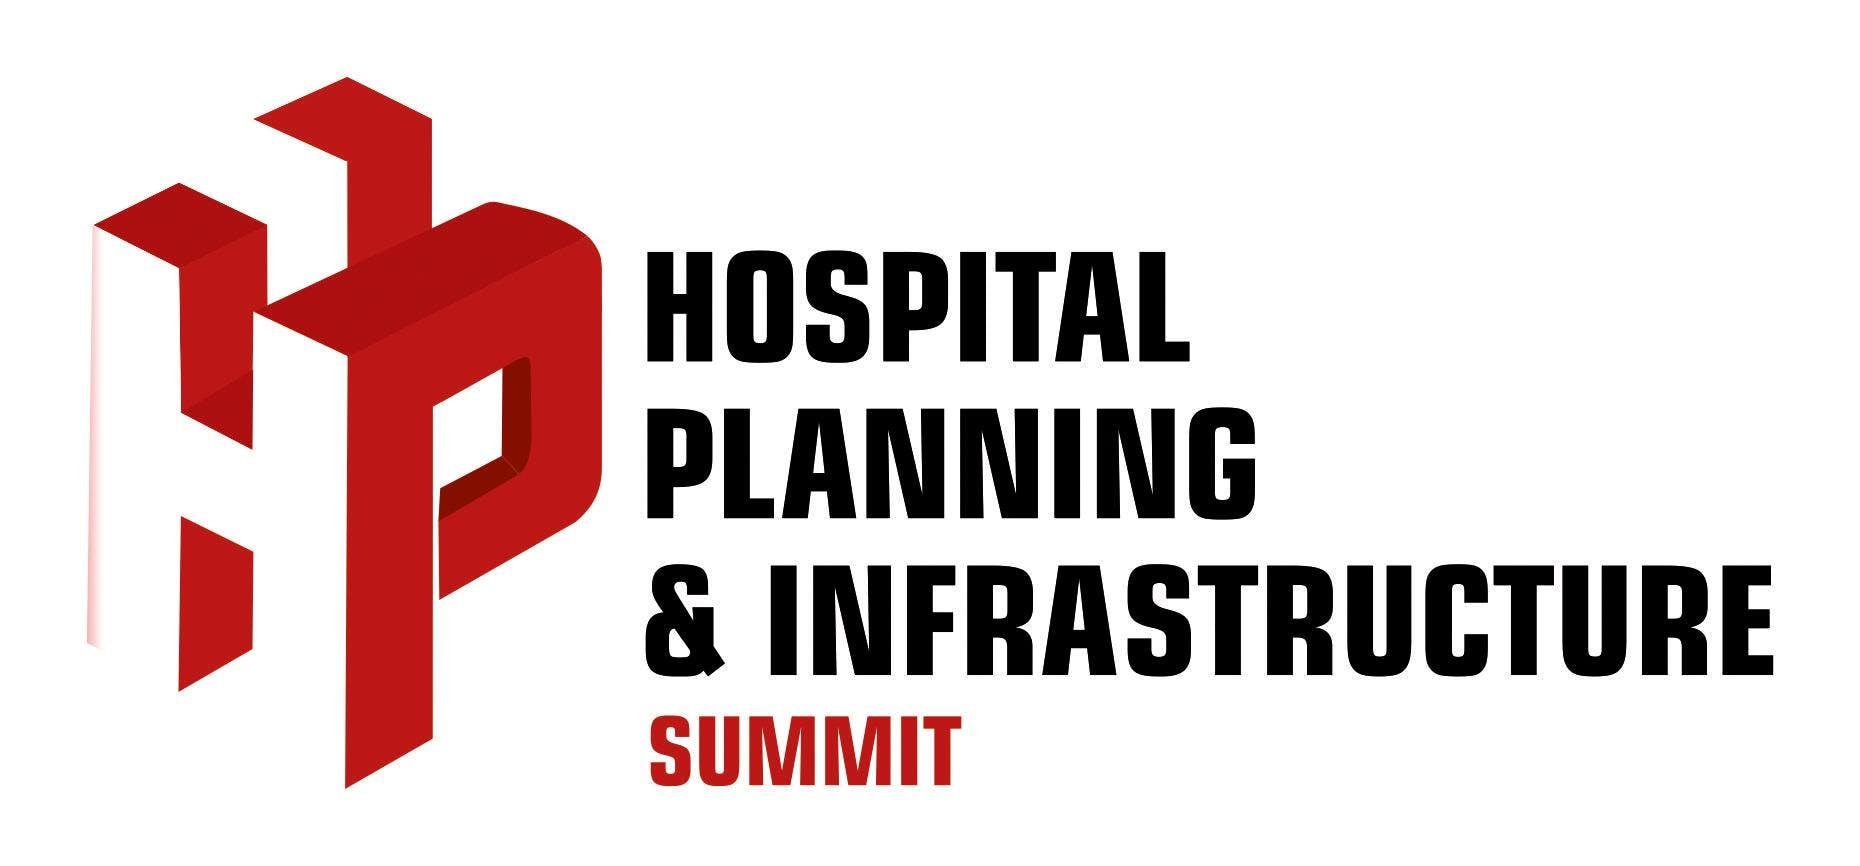 Hospital Planning & Infrastructure Summit Ahmedabad